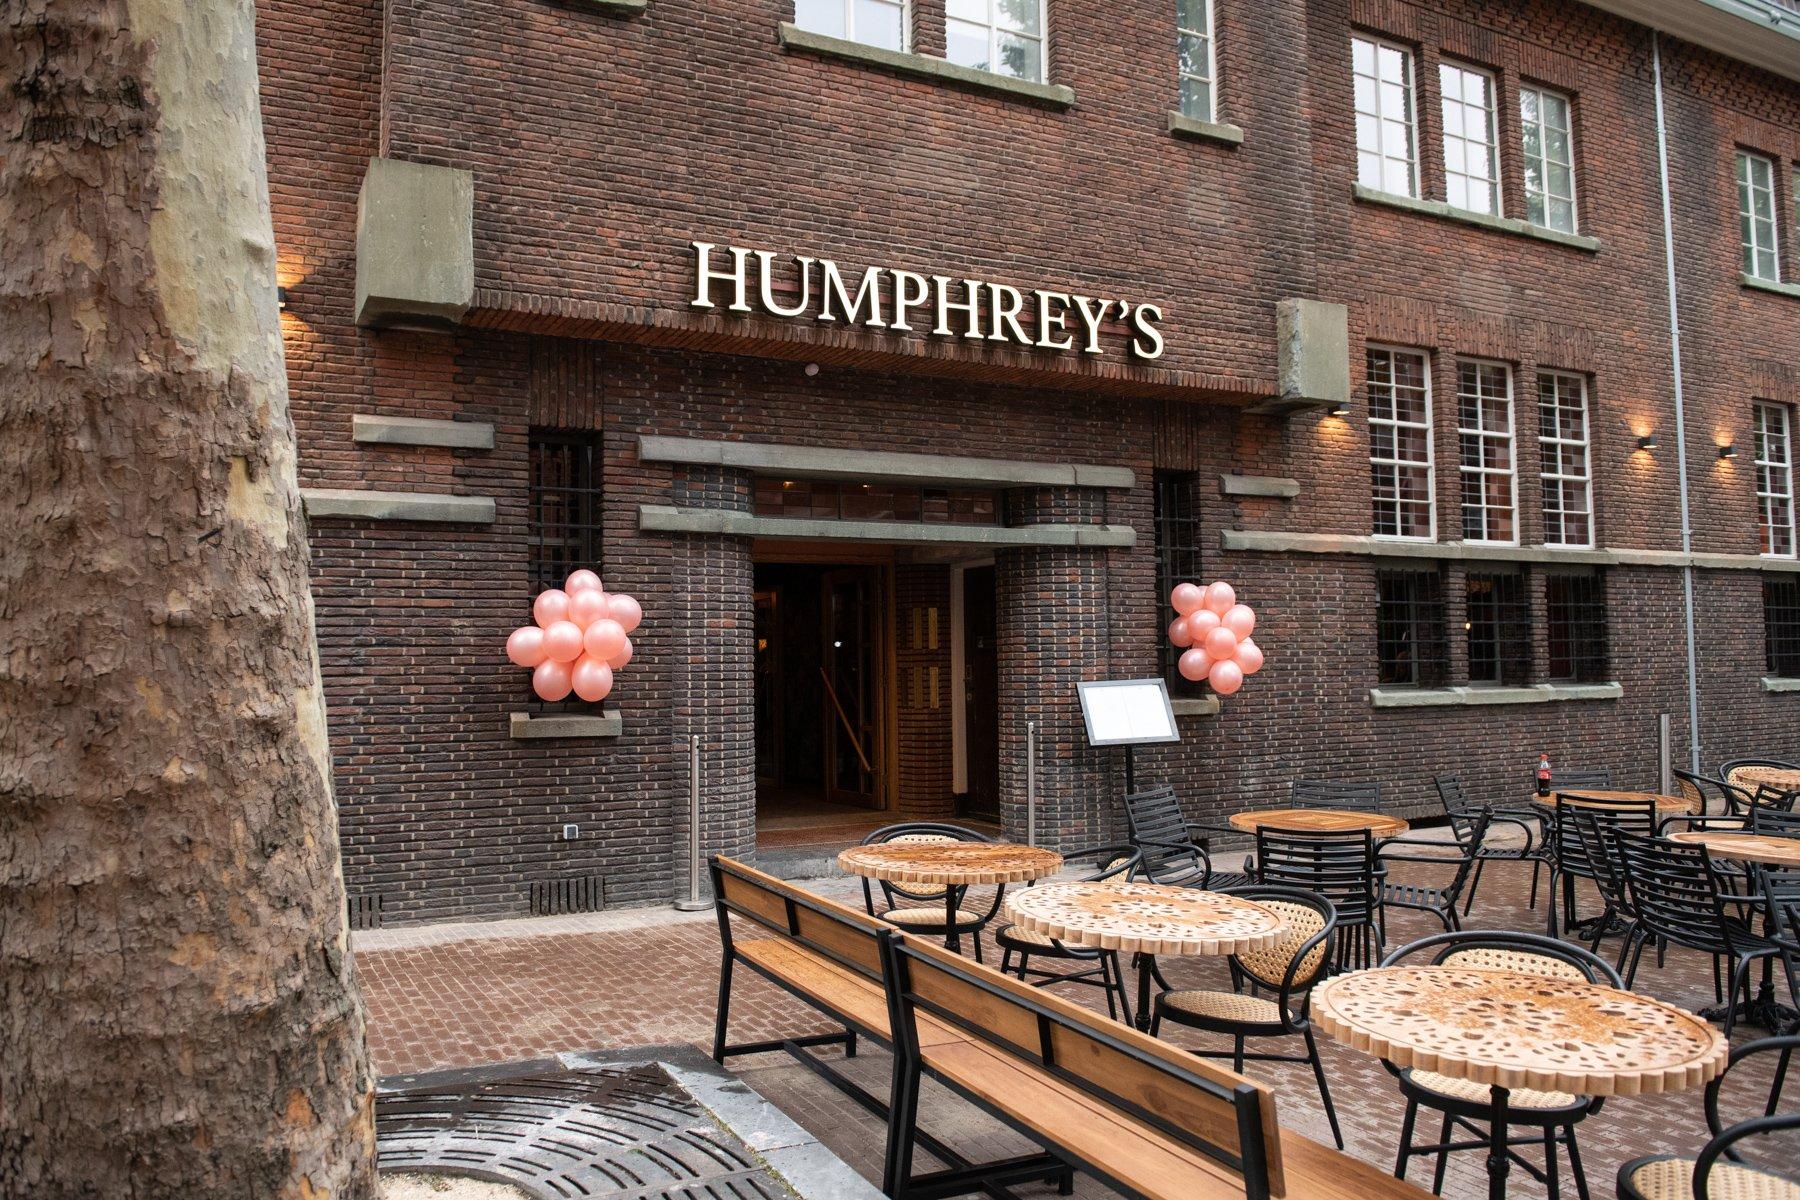 Humphrey's